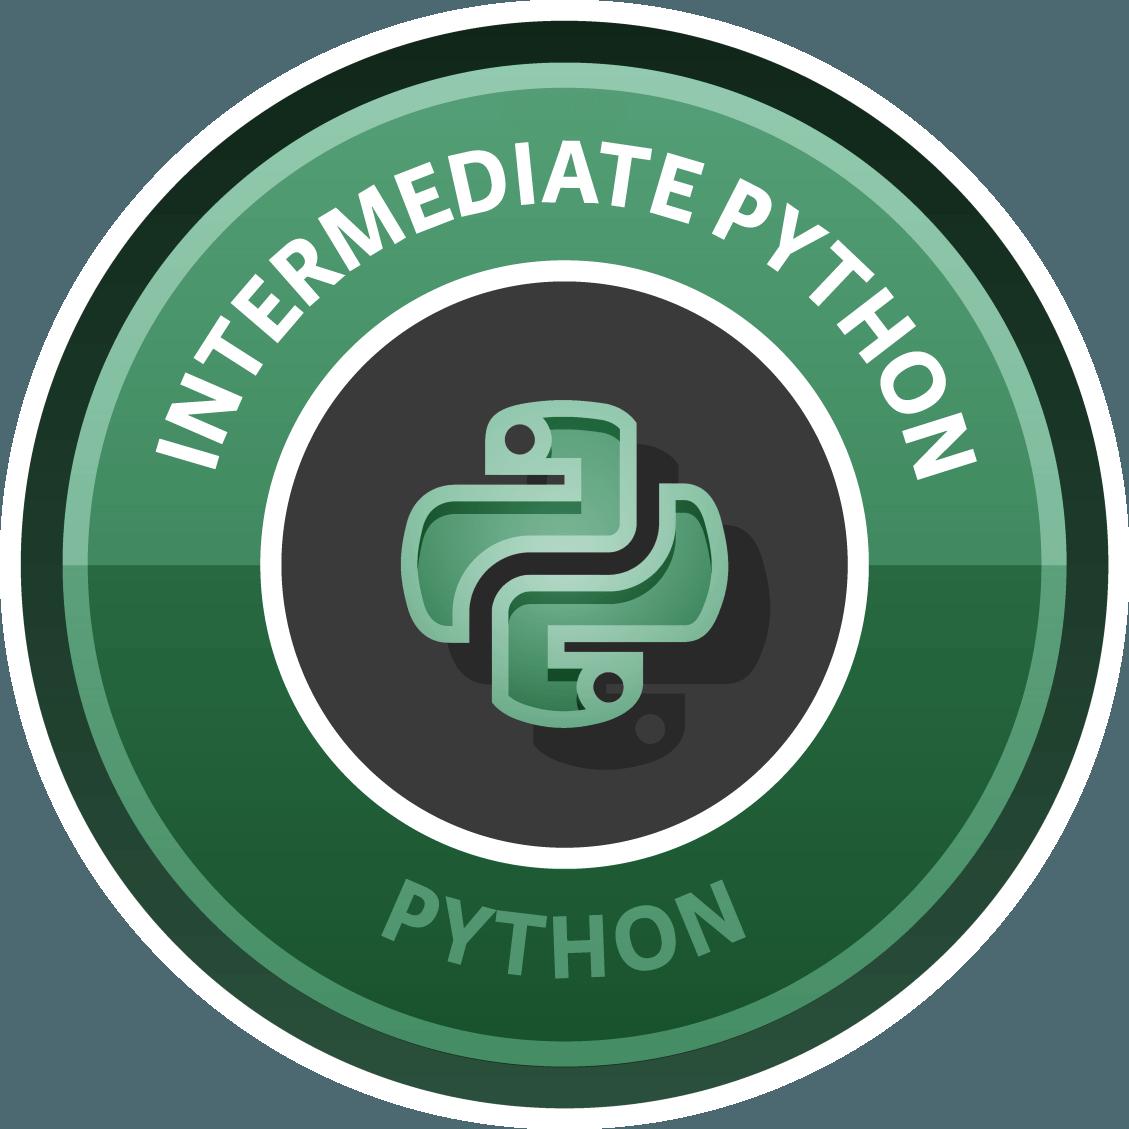 Intermediate Python for Data Science